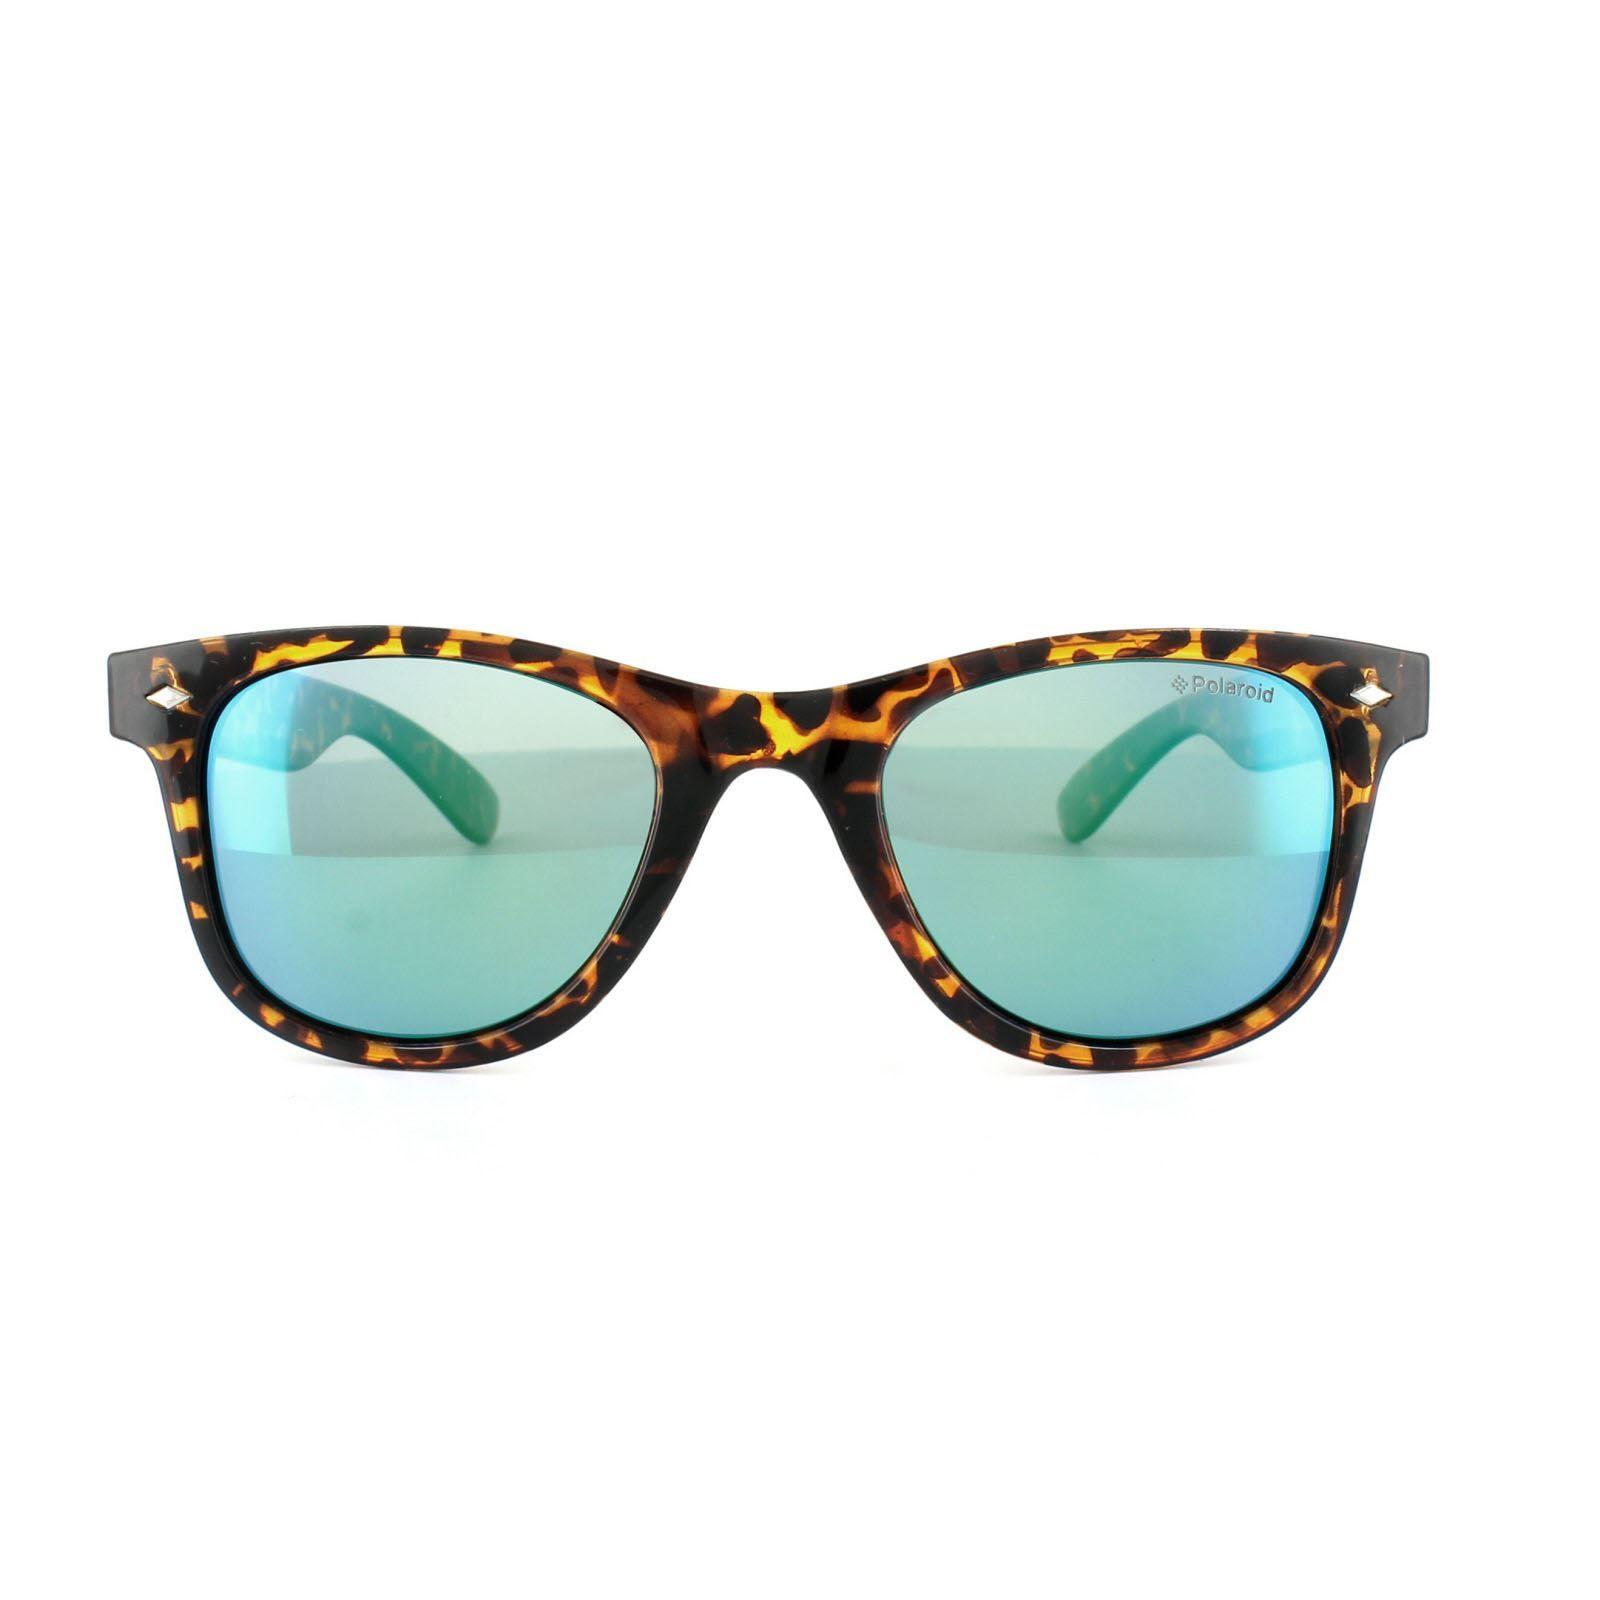 Polaroid Sunglasses 6009/S M V08 K7 Havana Green Blue Mirror Polarized